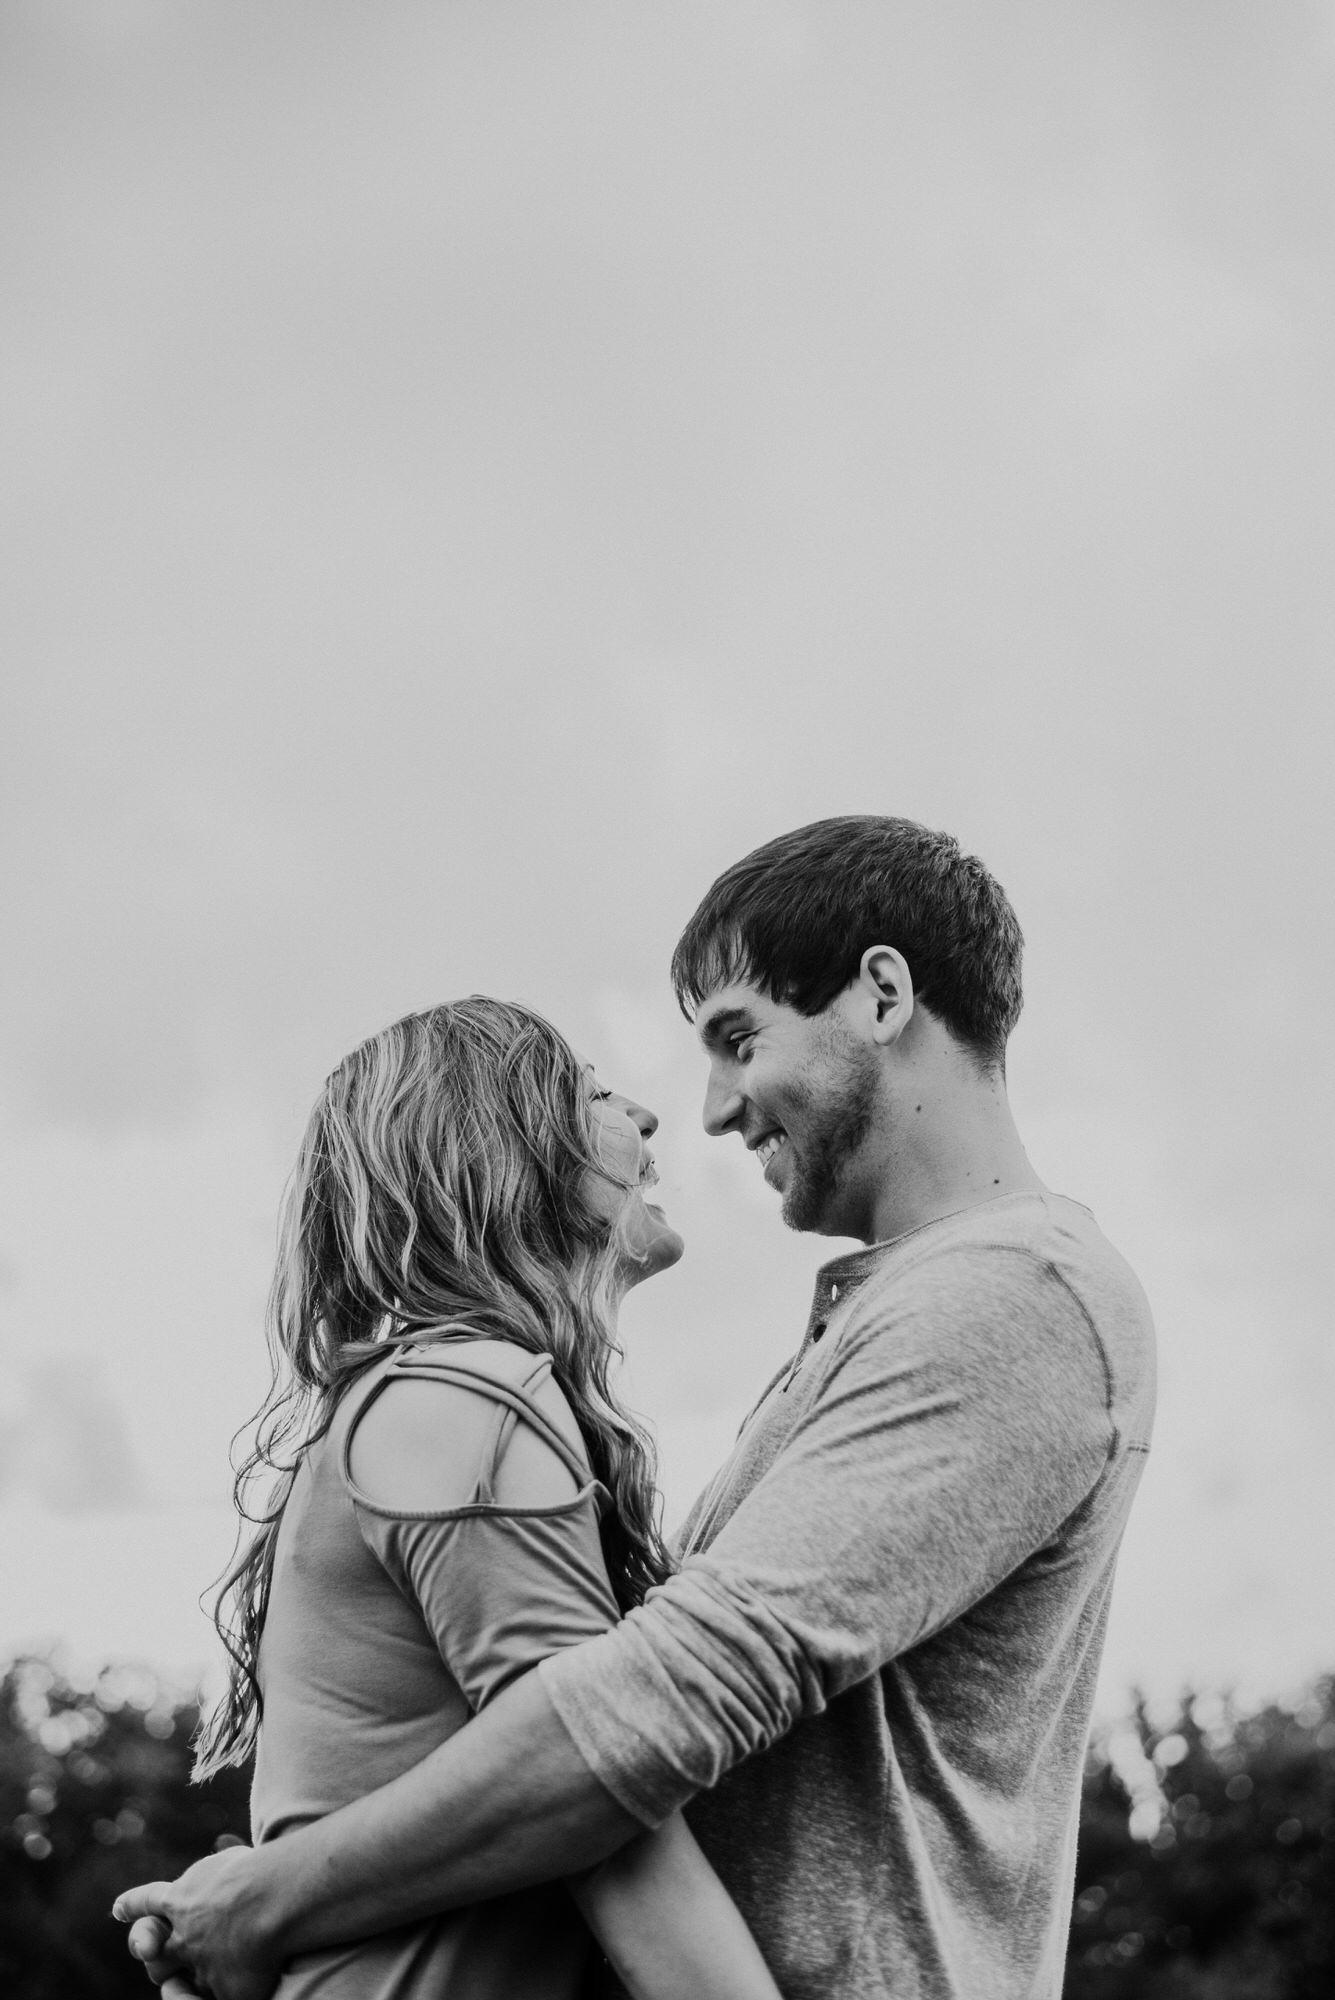 Kaylie-Sirek-Photography-wedding-engagement-photographer-Grand-Island-Kearney-Hastings-Lincoln-Nebraska-central-midwest-moments-trump-posing-natural-light-engaged-15.jpg